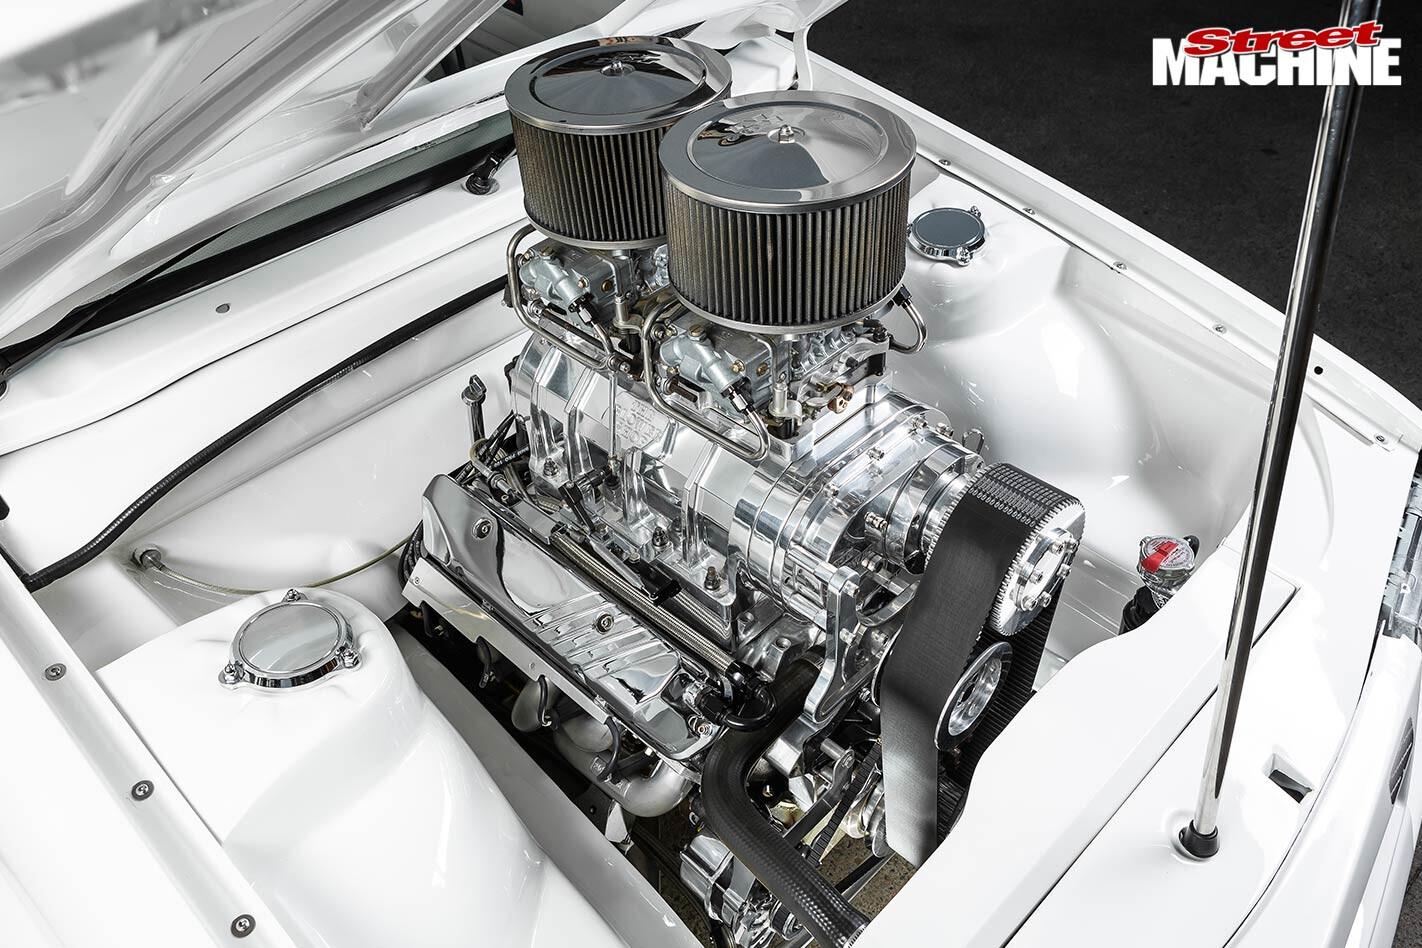 Holden VK engine bay